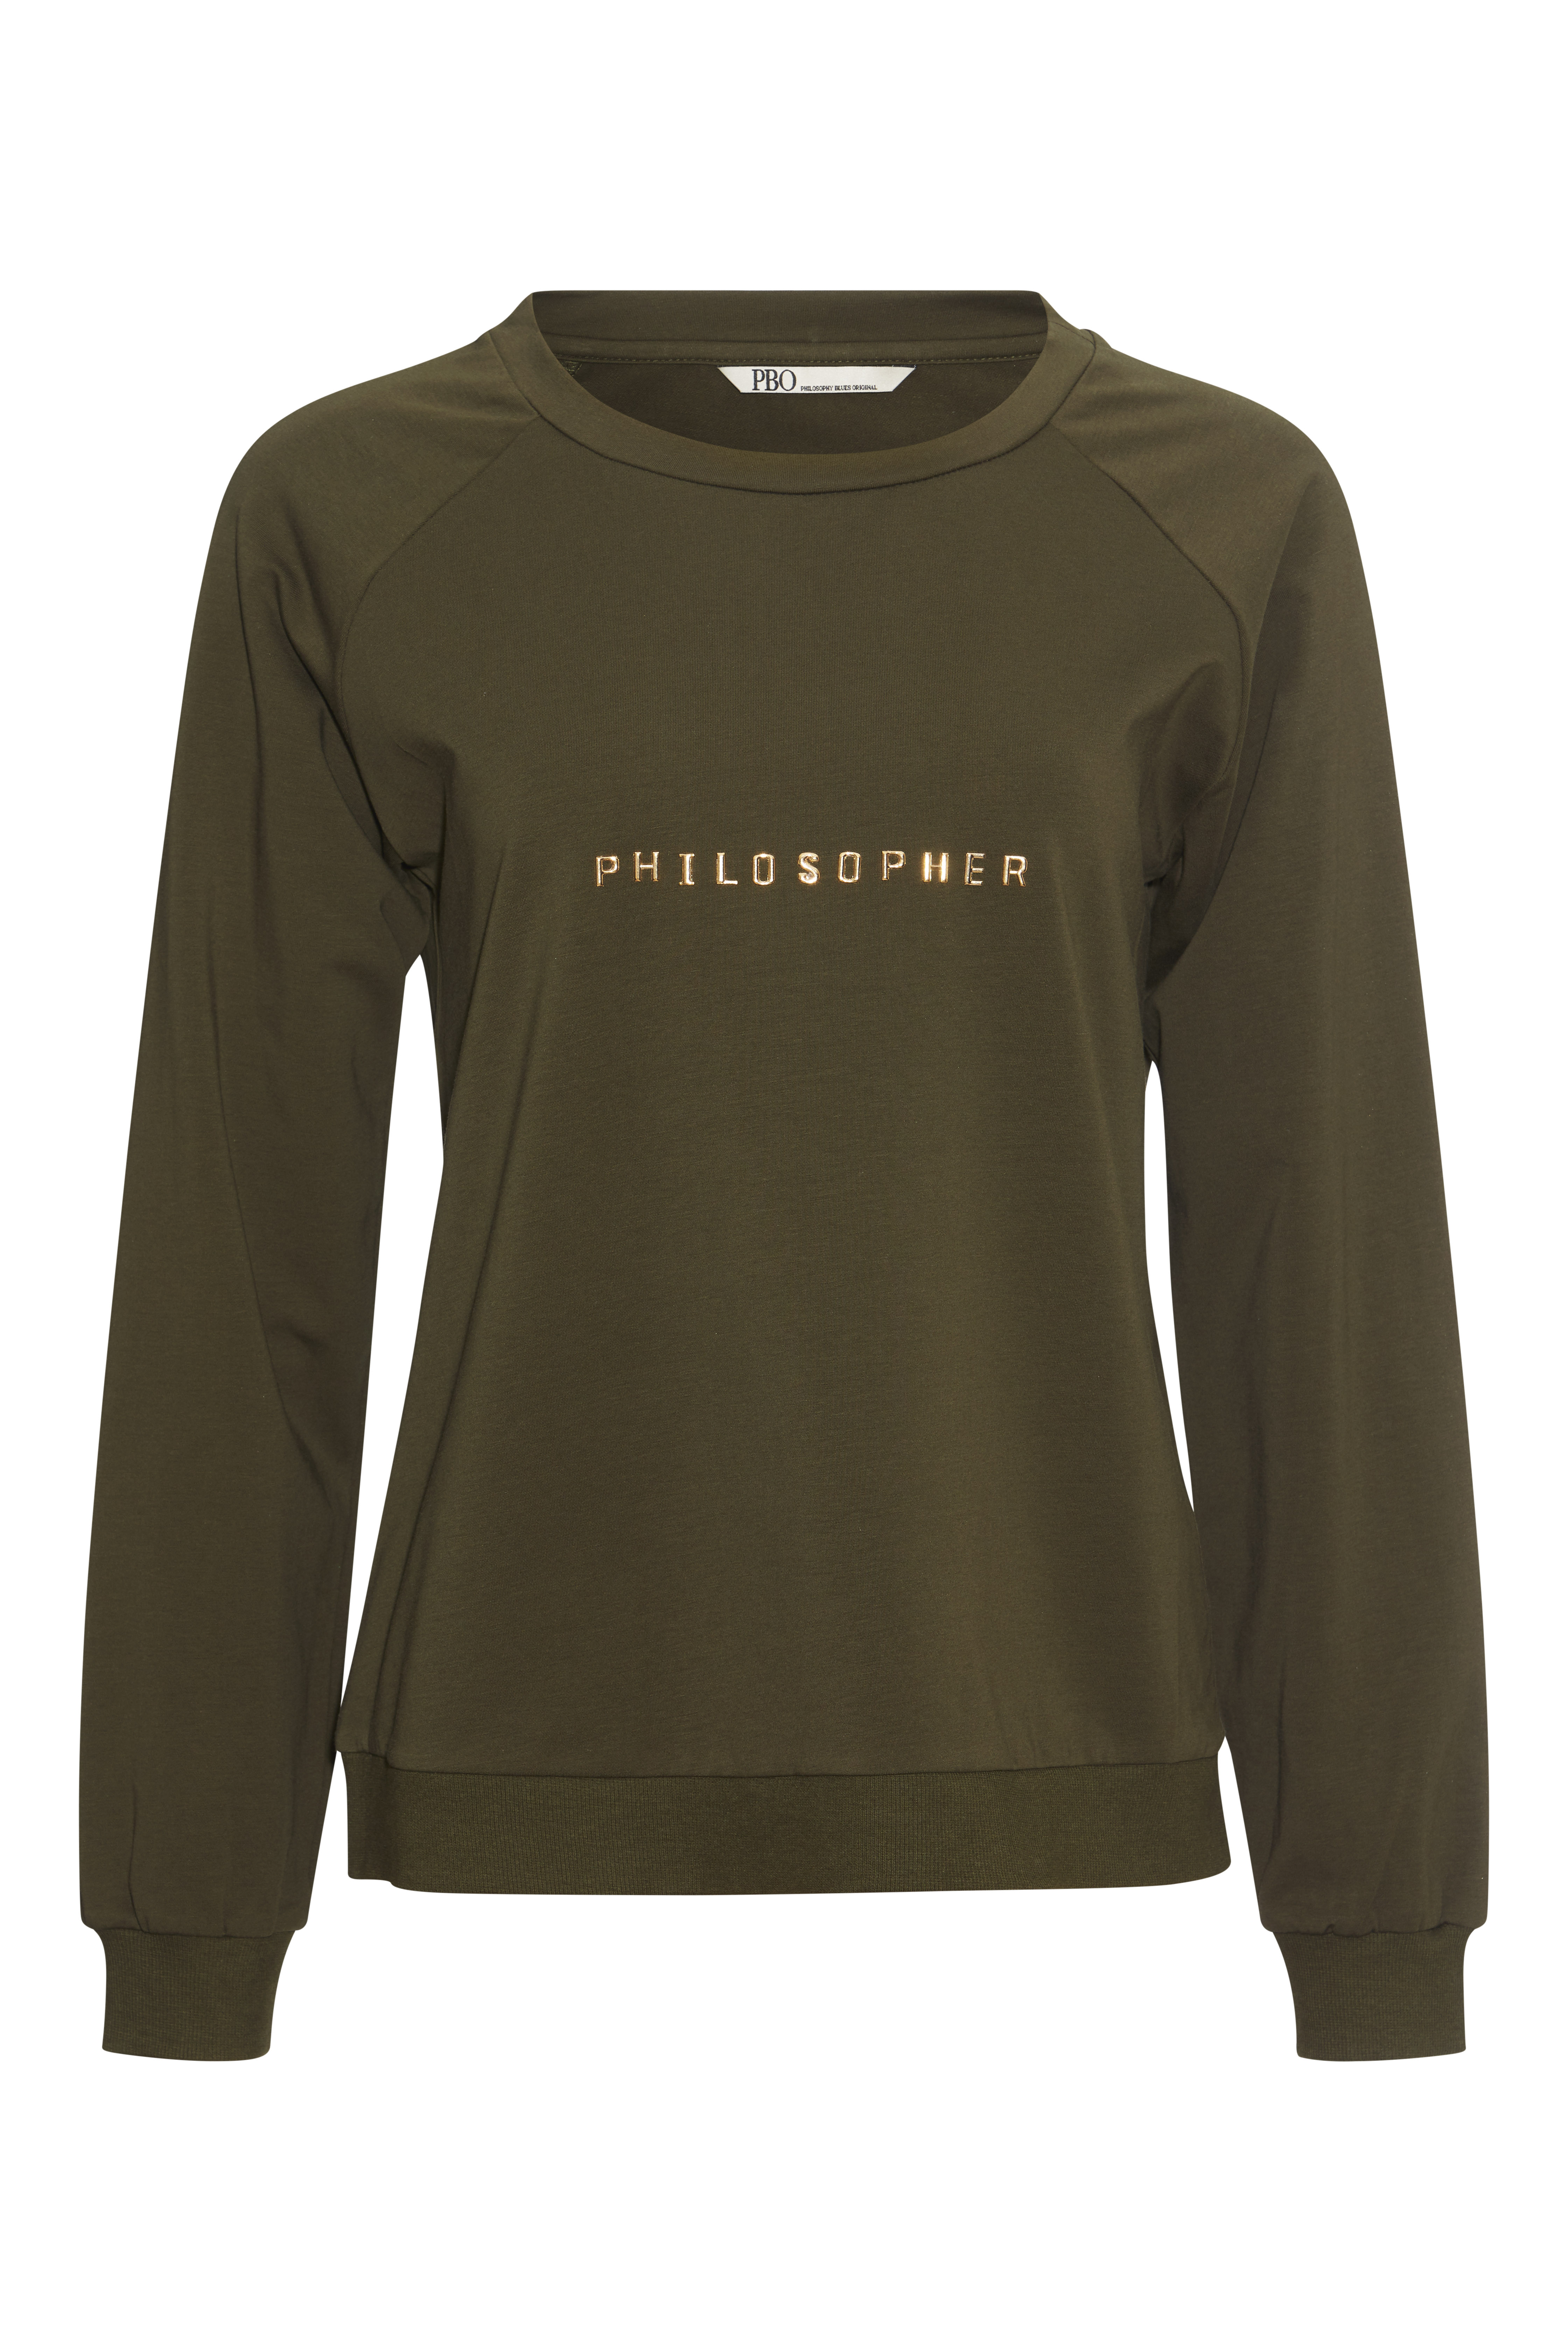 PBO 2391 Folsom sweatshirts, ivy green, small